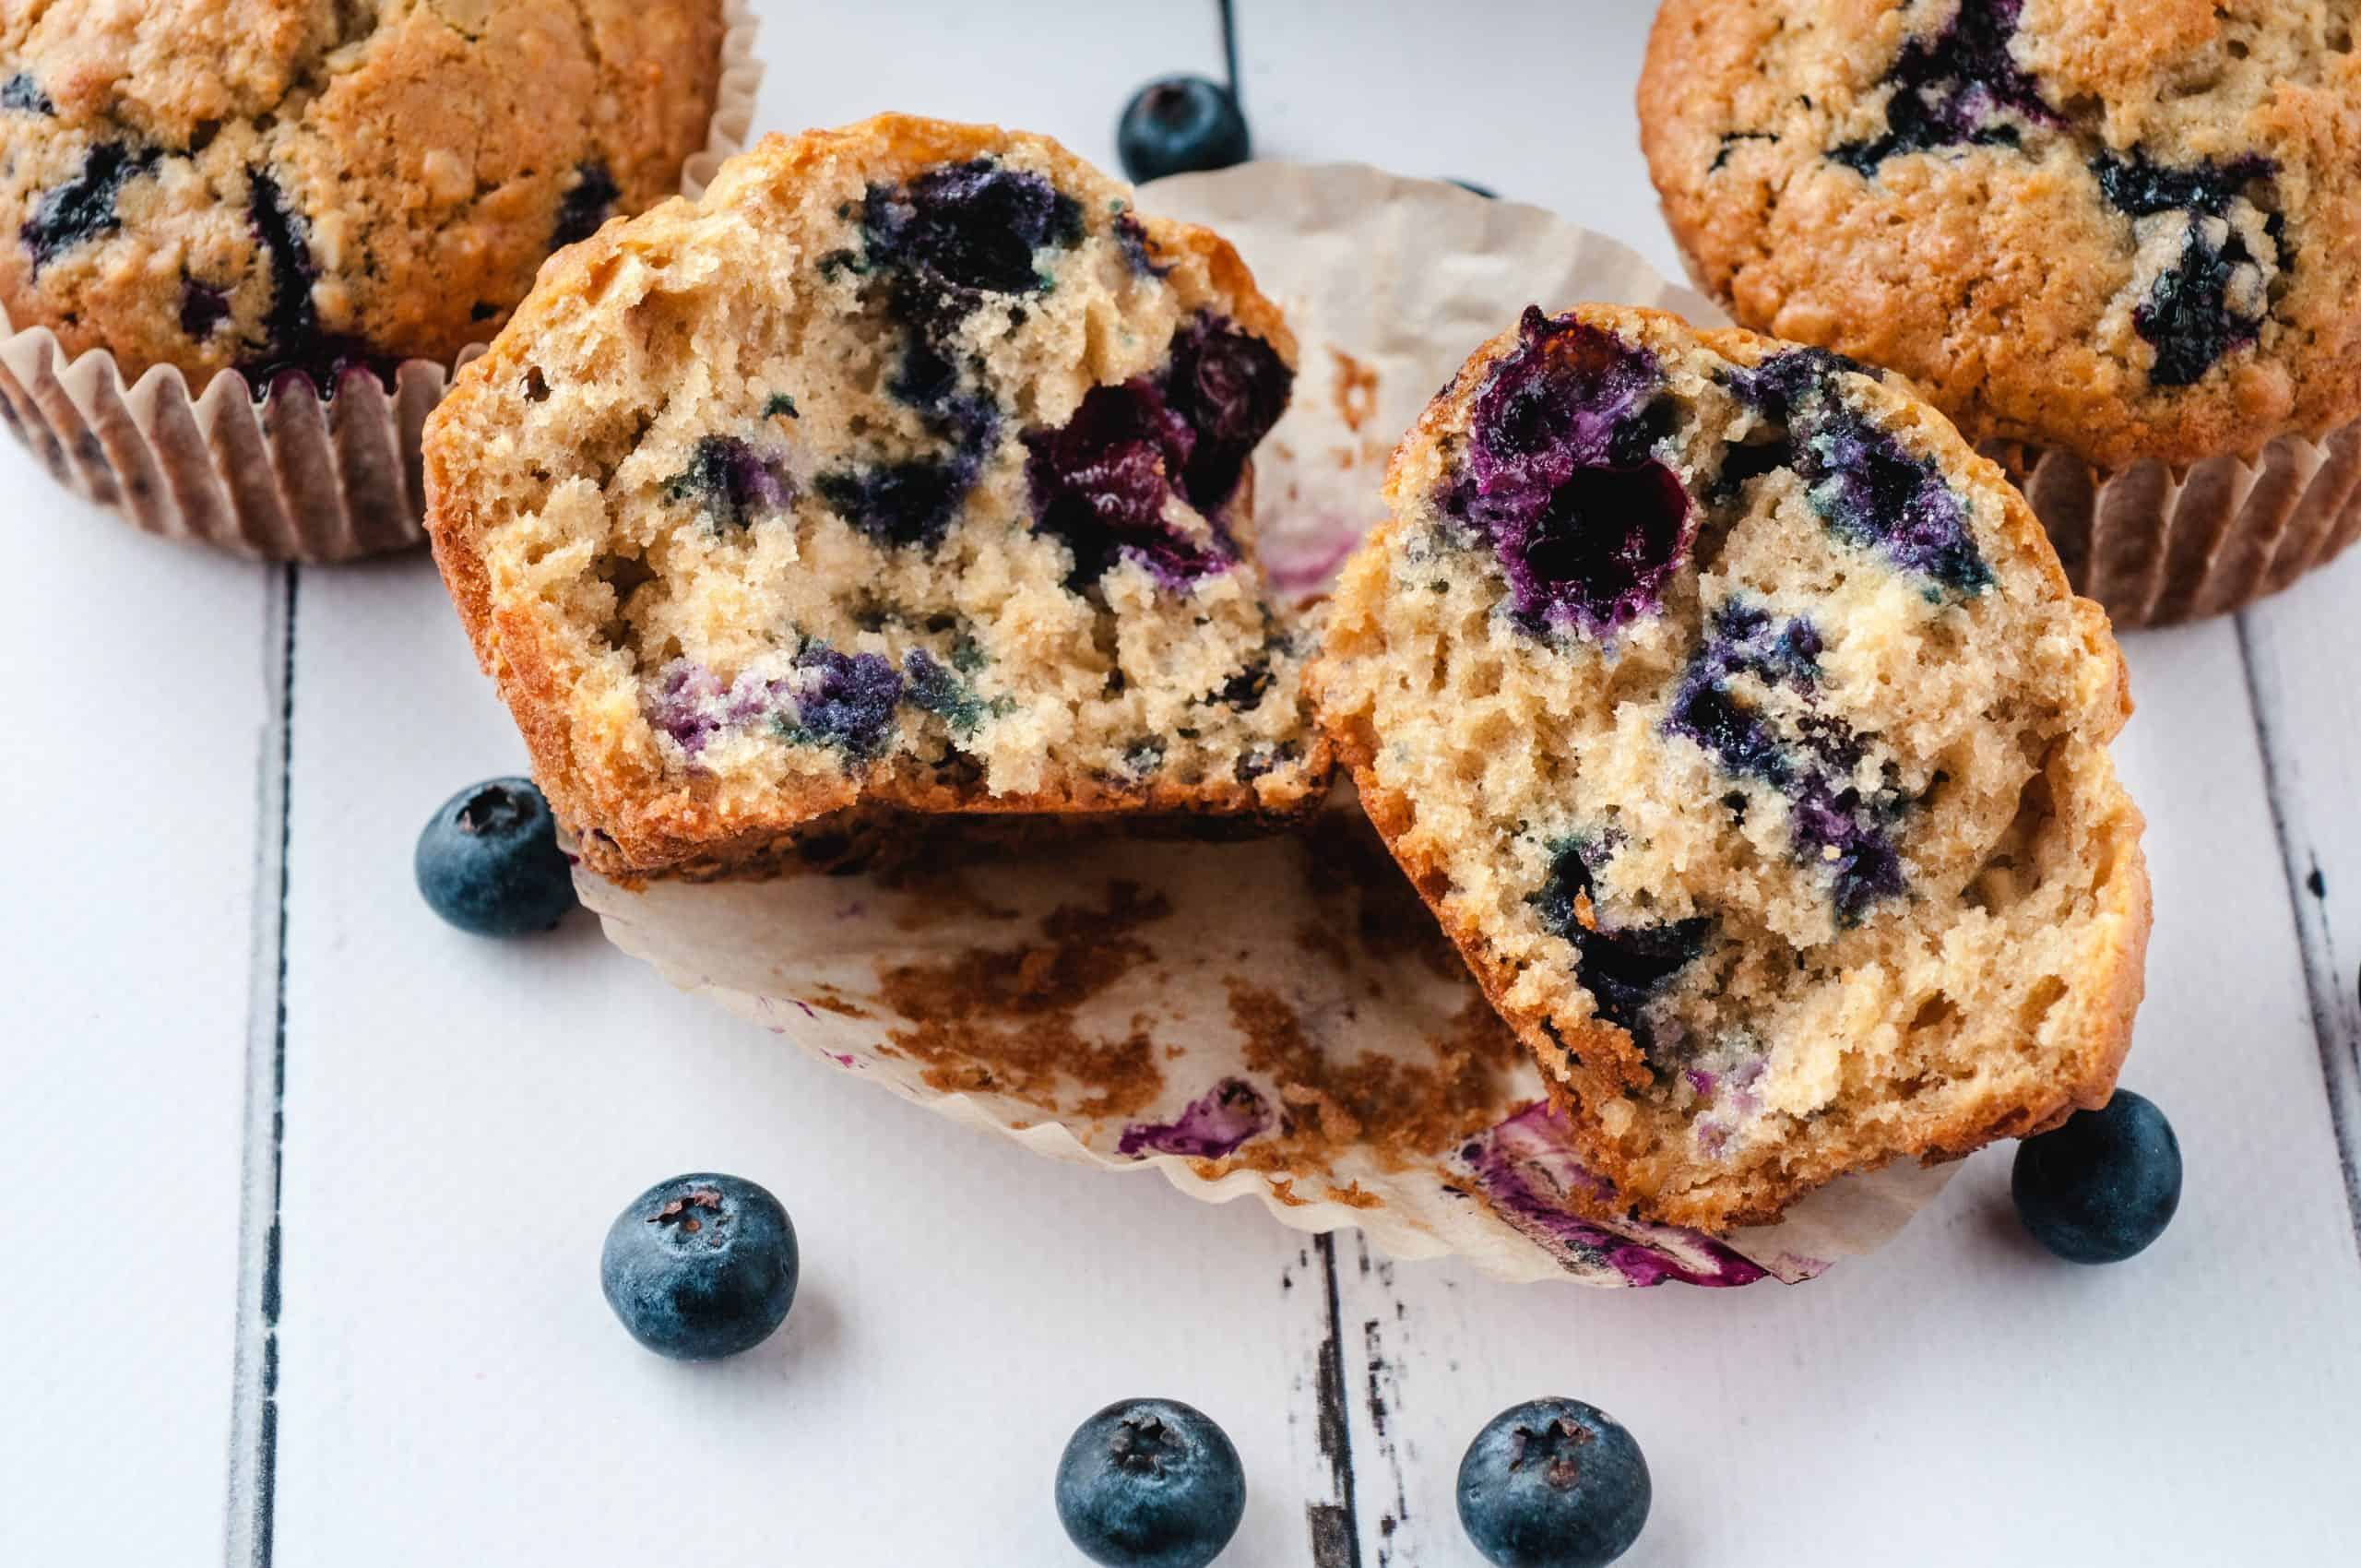 Fresh blueberry muffins with one broken in half on white background.